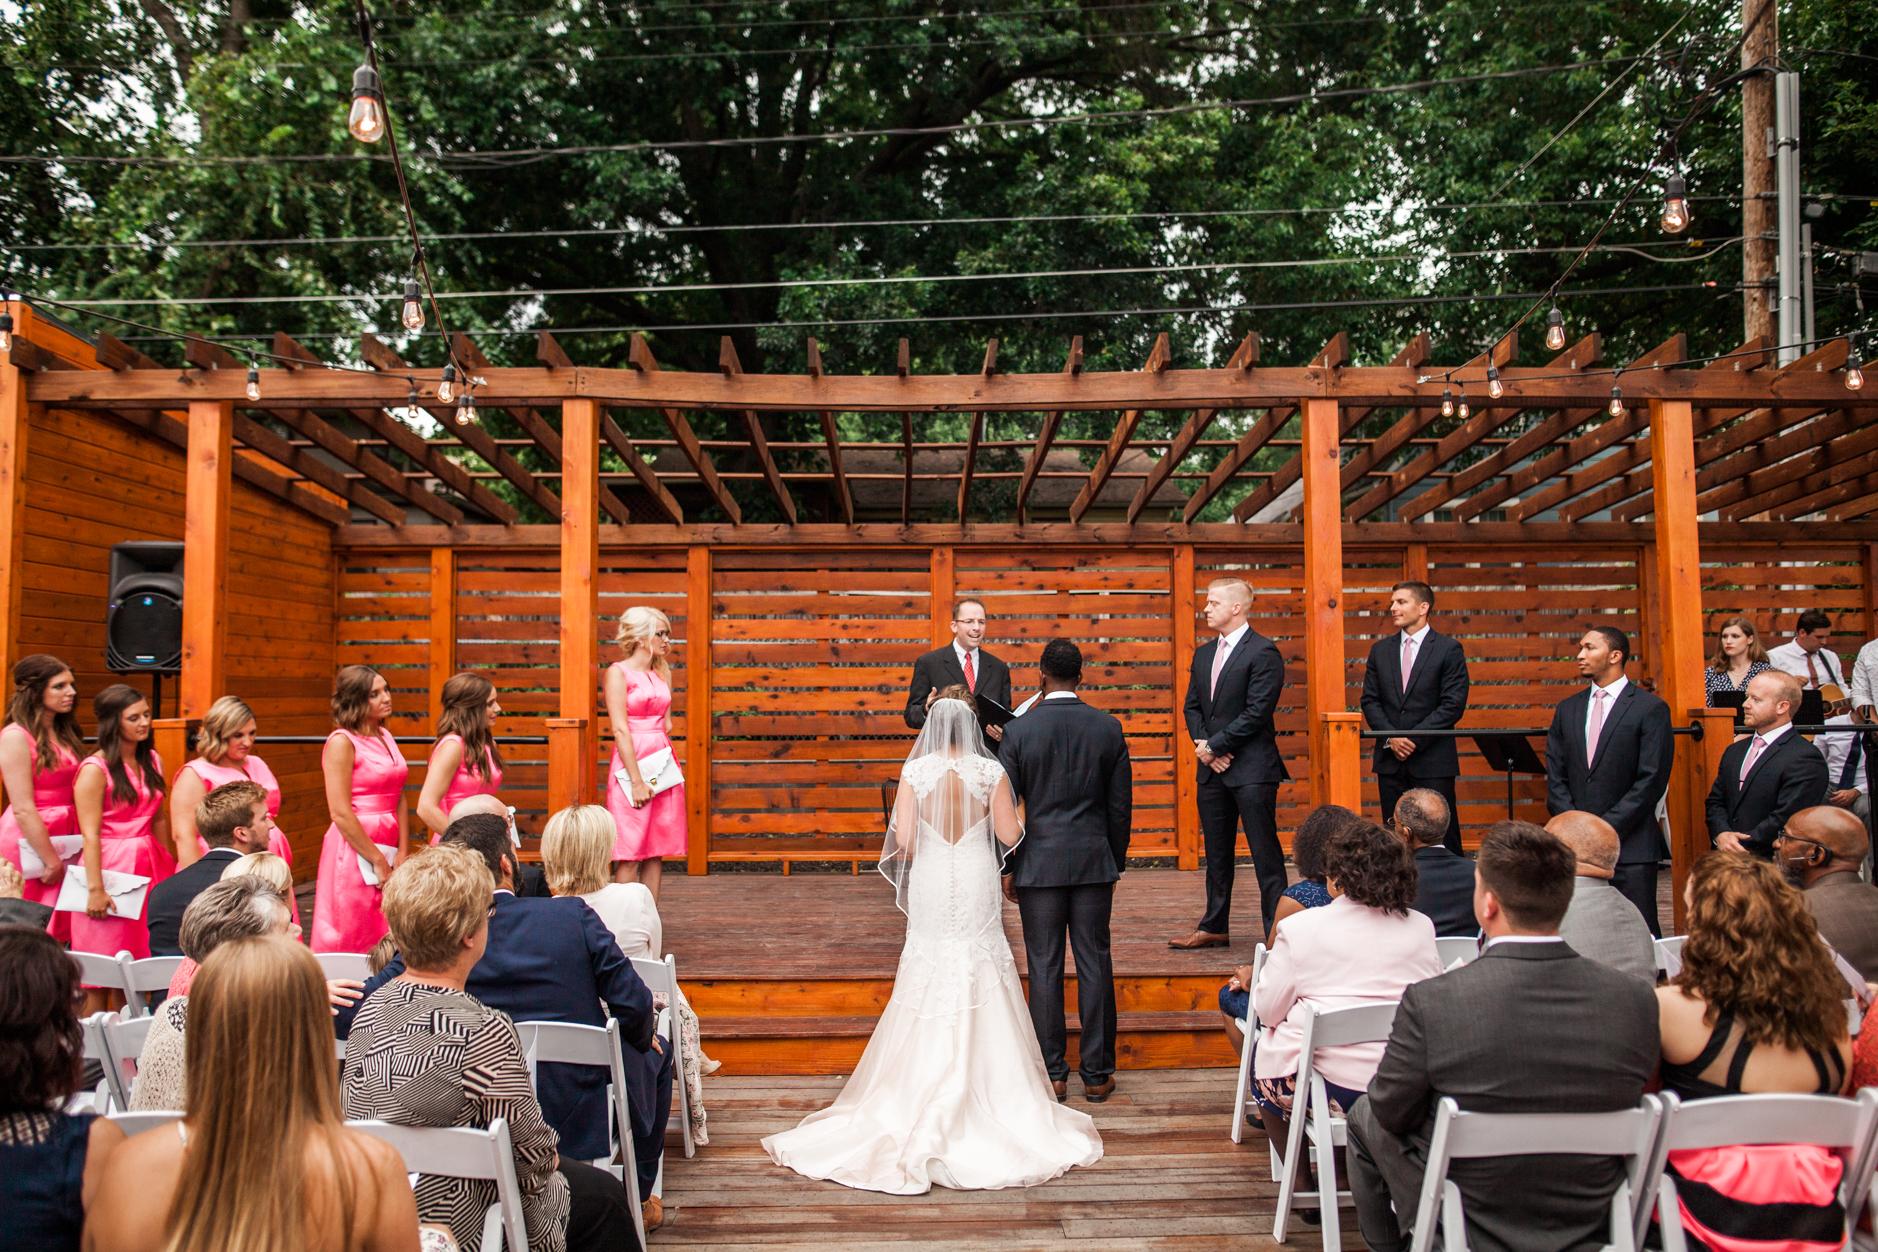 LegacyUnion-Wedding-Photographer-Glendale-CA-54.jpg